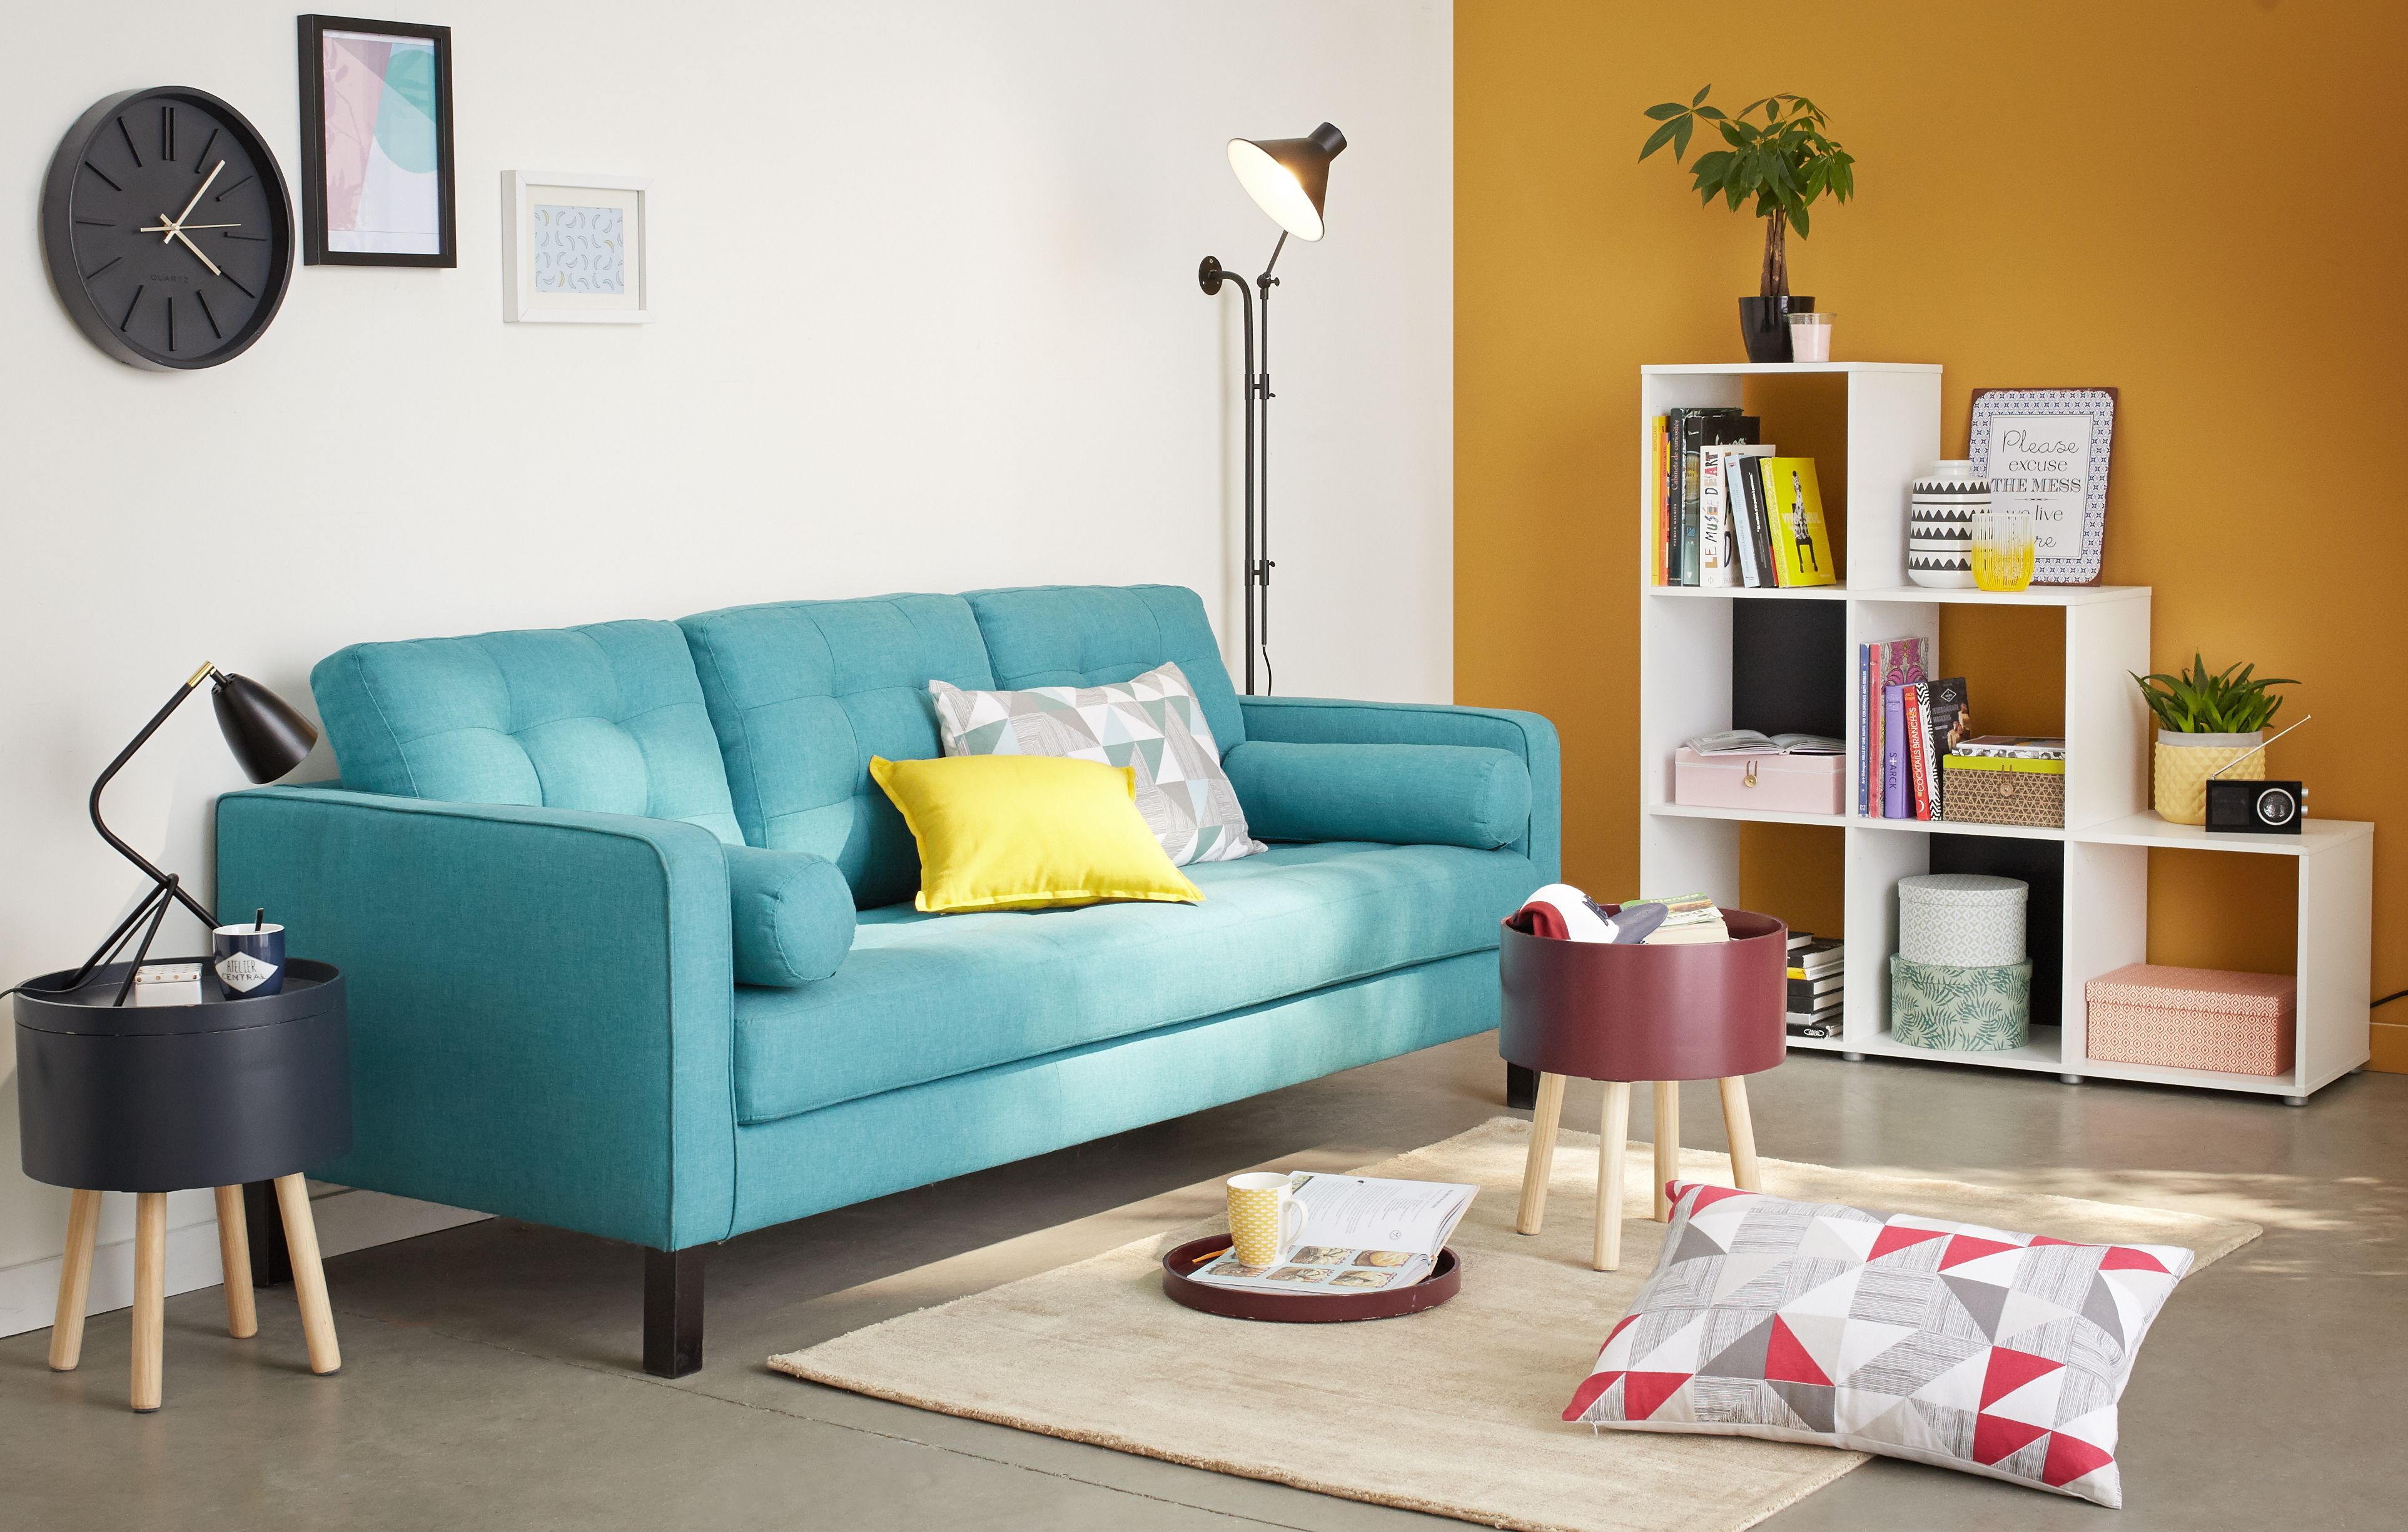 finest canap places fixe revtement tissu turquoise elvis canapes tous les canaps canaps droits. Black Bedroom Furniture Sets. Home Design Ideas